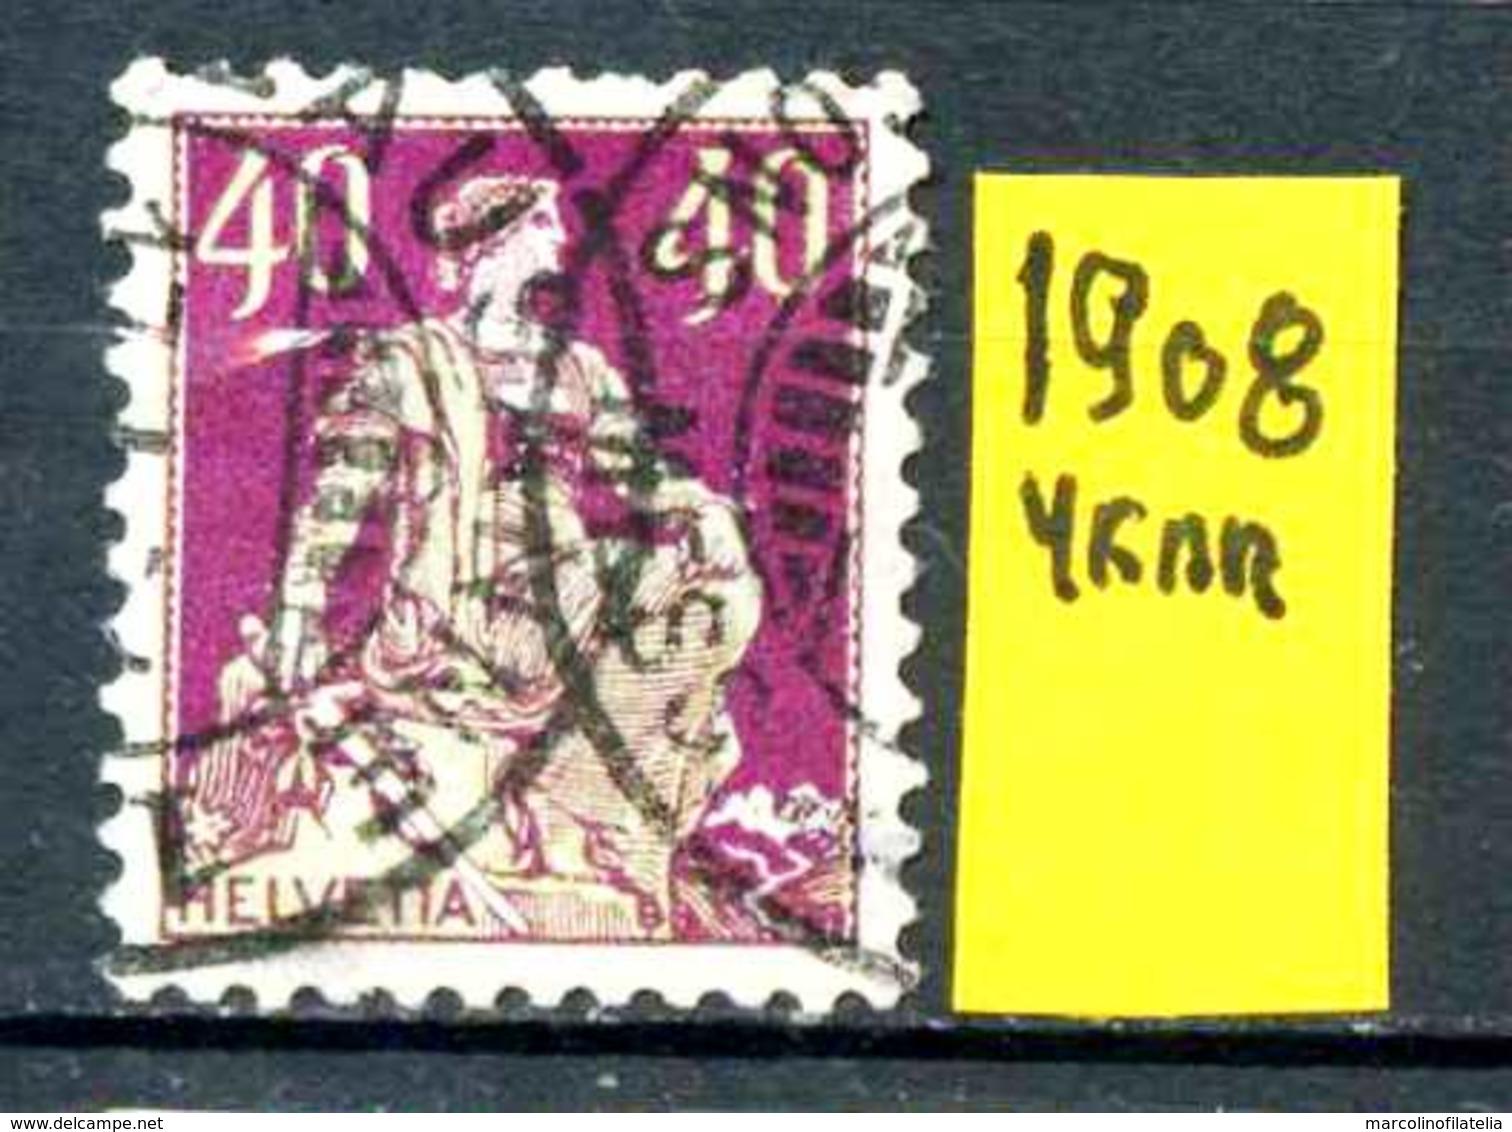 SVIZZERA - HELVETIA - Year 1908 - Traveled - Viaggiato - Vojagè - Gereist. - Svizzera